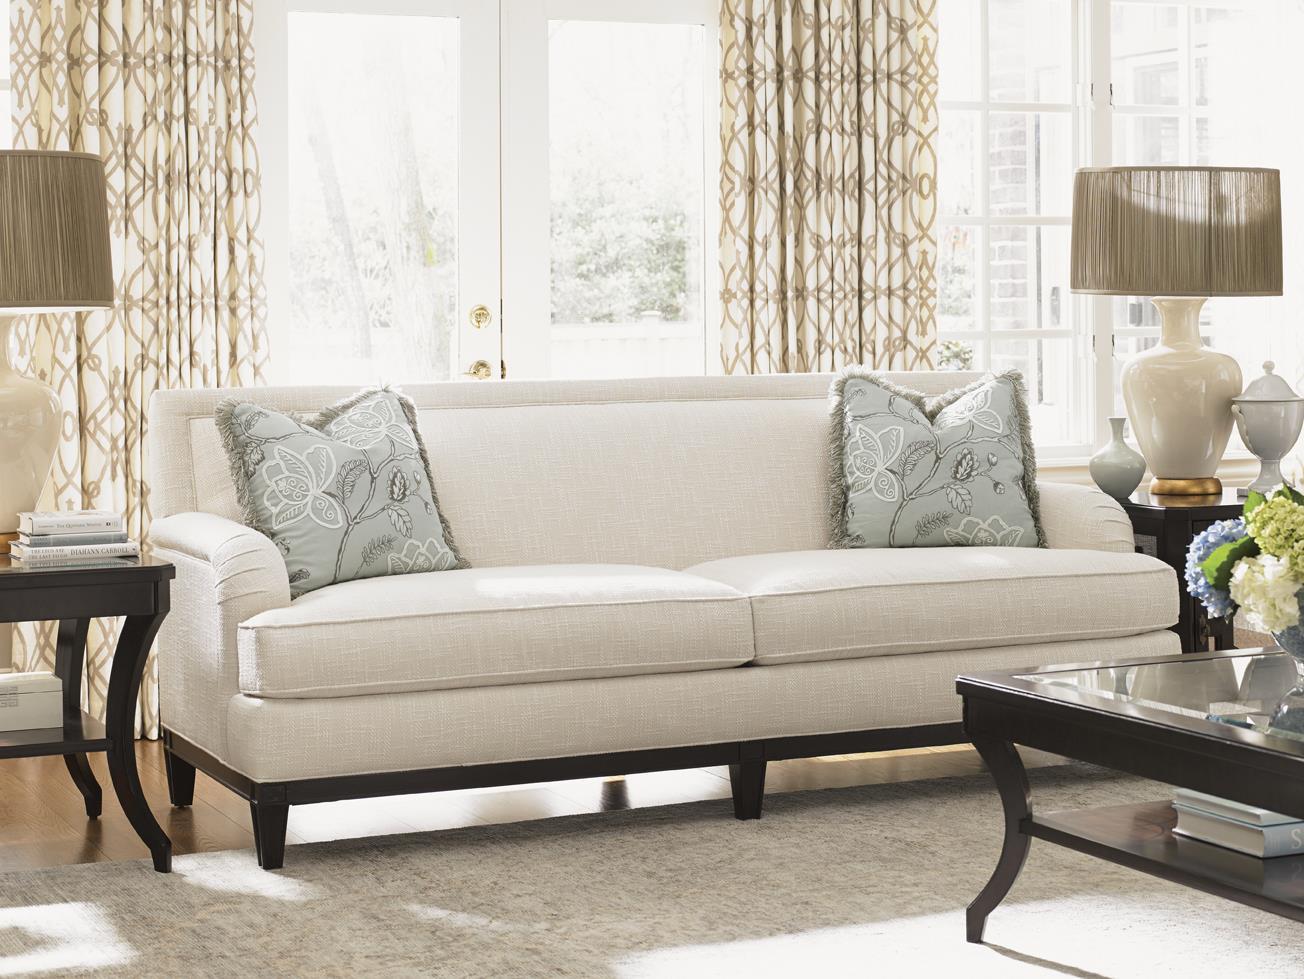 sofa wood frame exposed uk beige color lexington kensington place transitional aubrey with